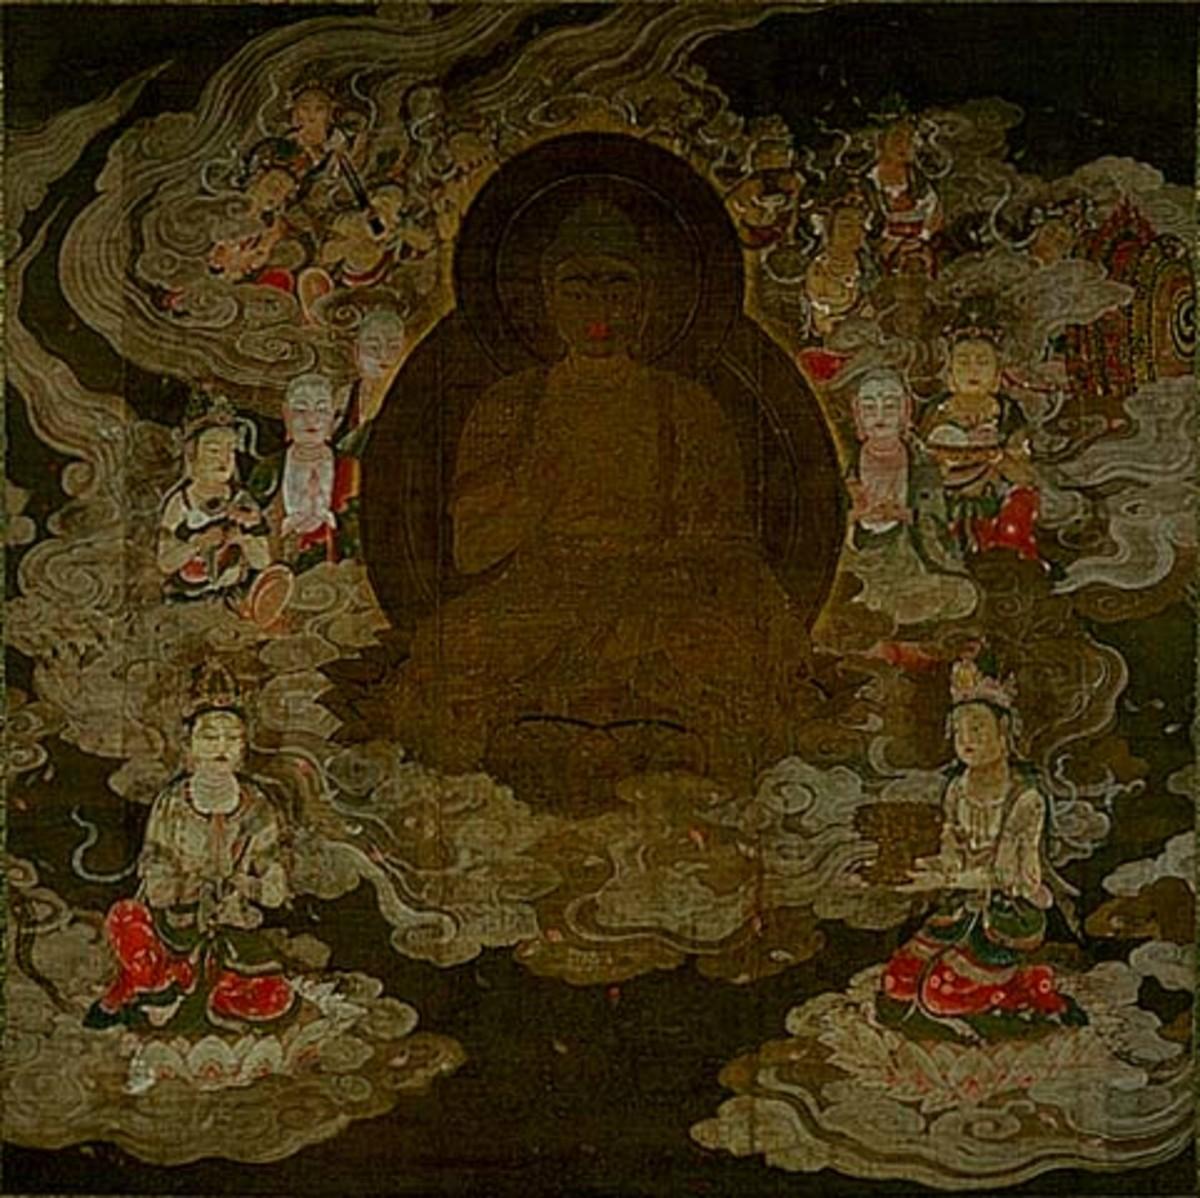 Late Heian portrayal of the Amida Buddha, painted on silk.